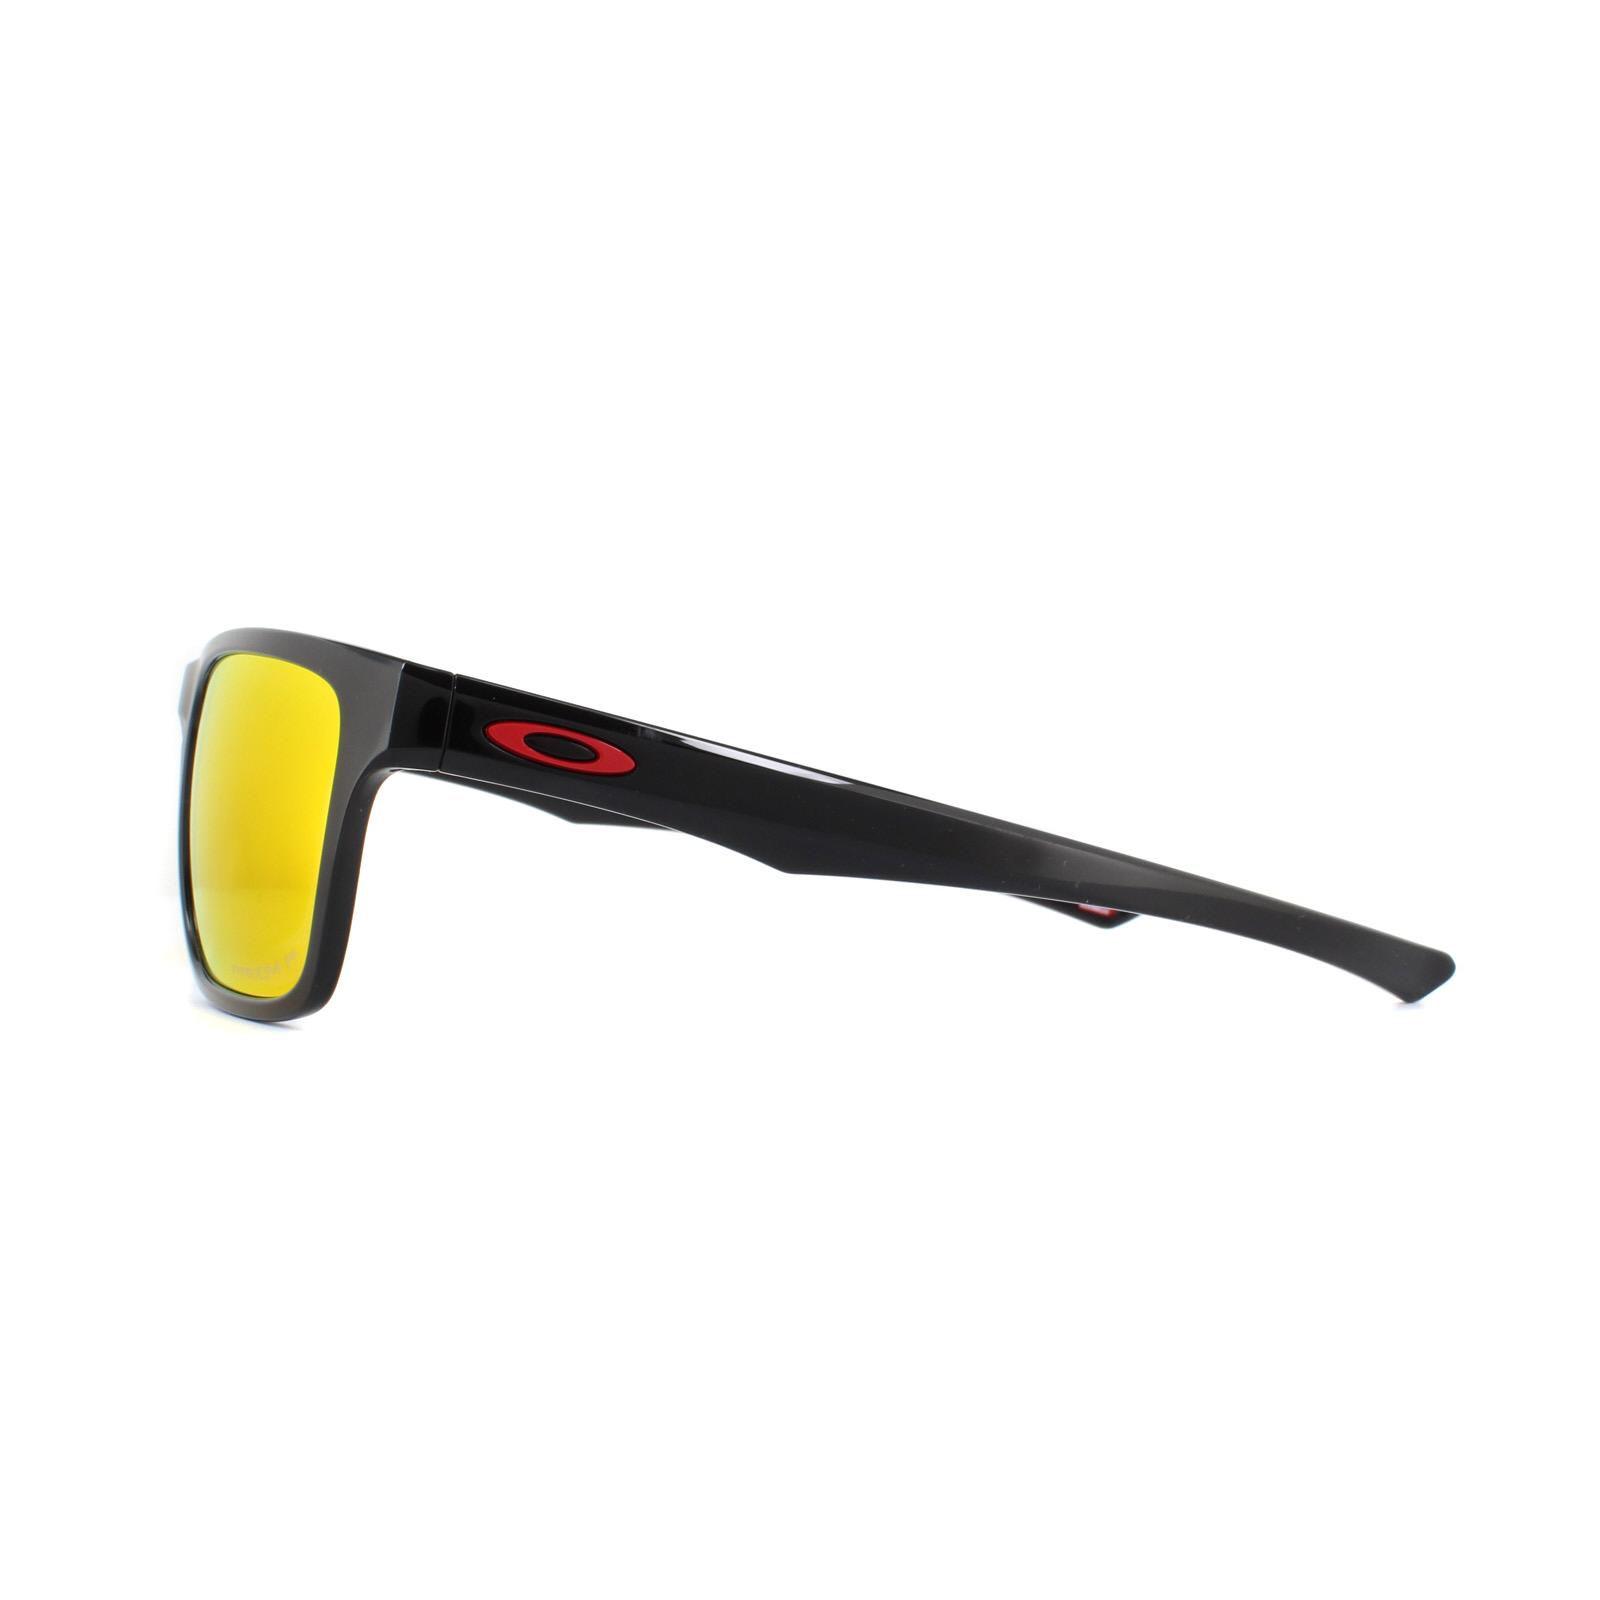 9c22934078 Oakley Sunglasses Holston OO9334-12 Polished Black Prizm Ruby ...